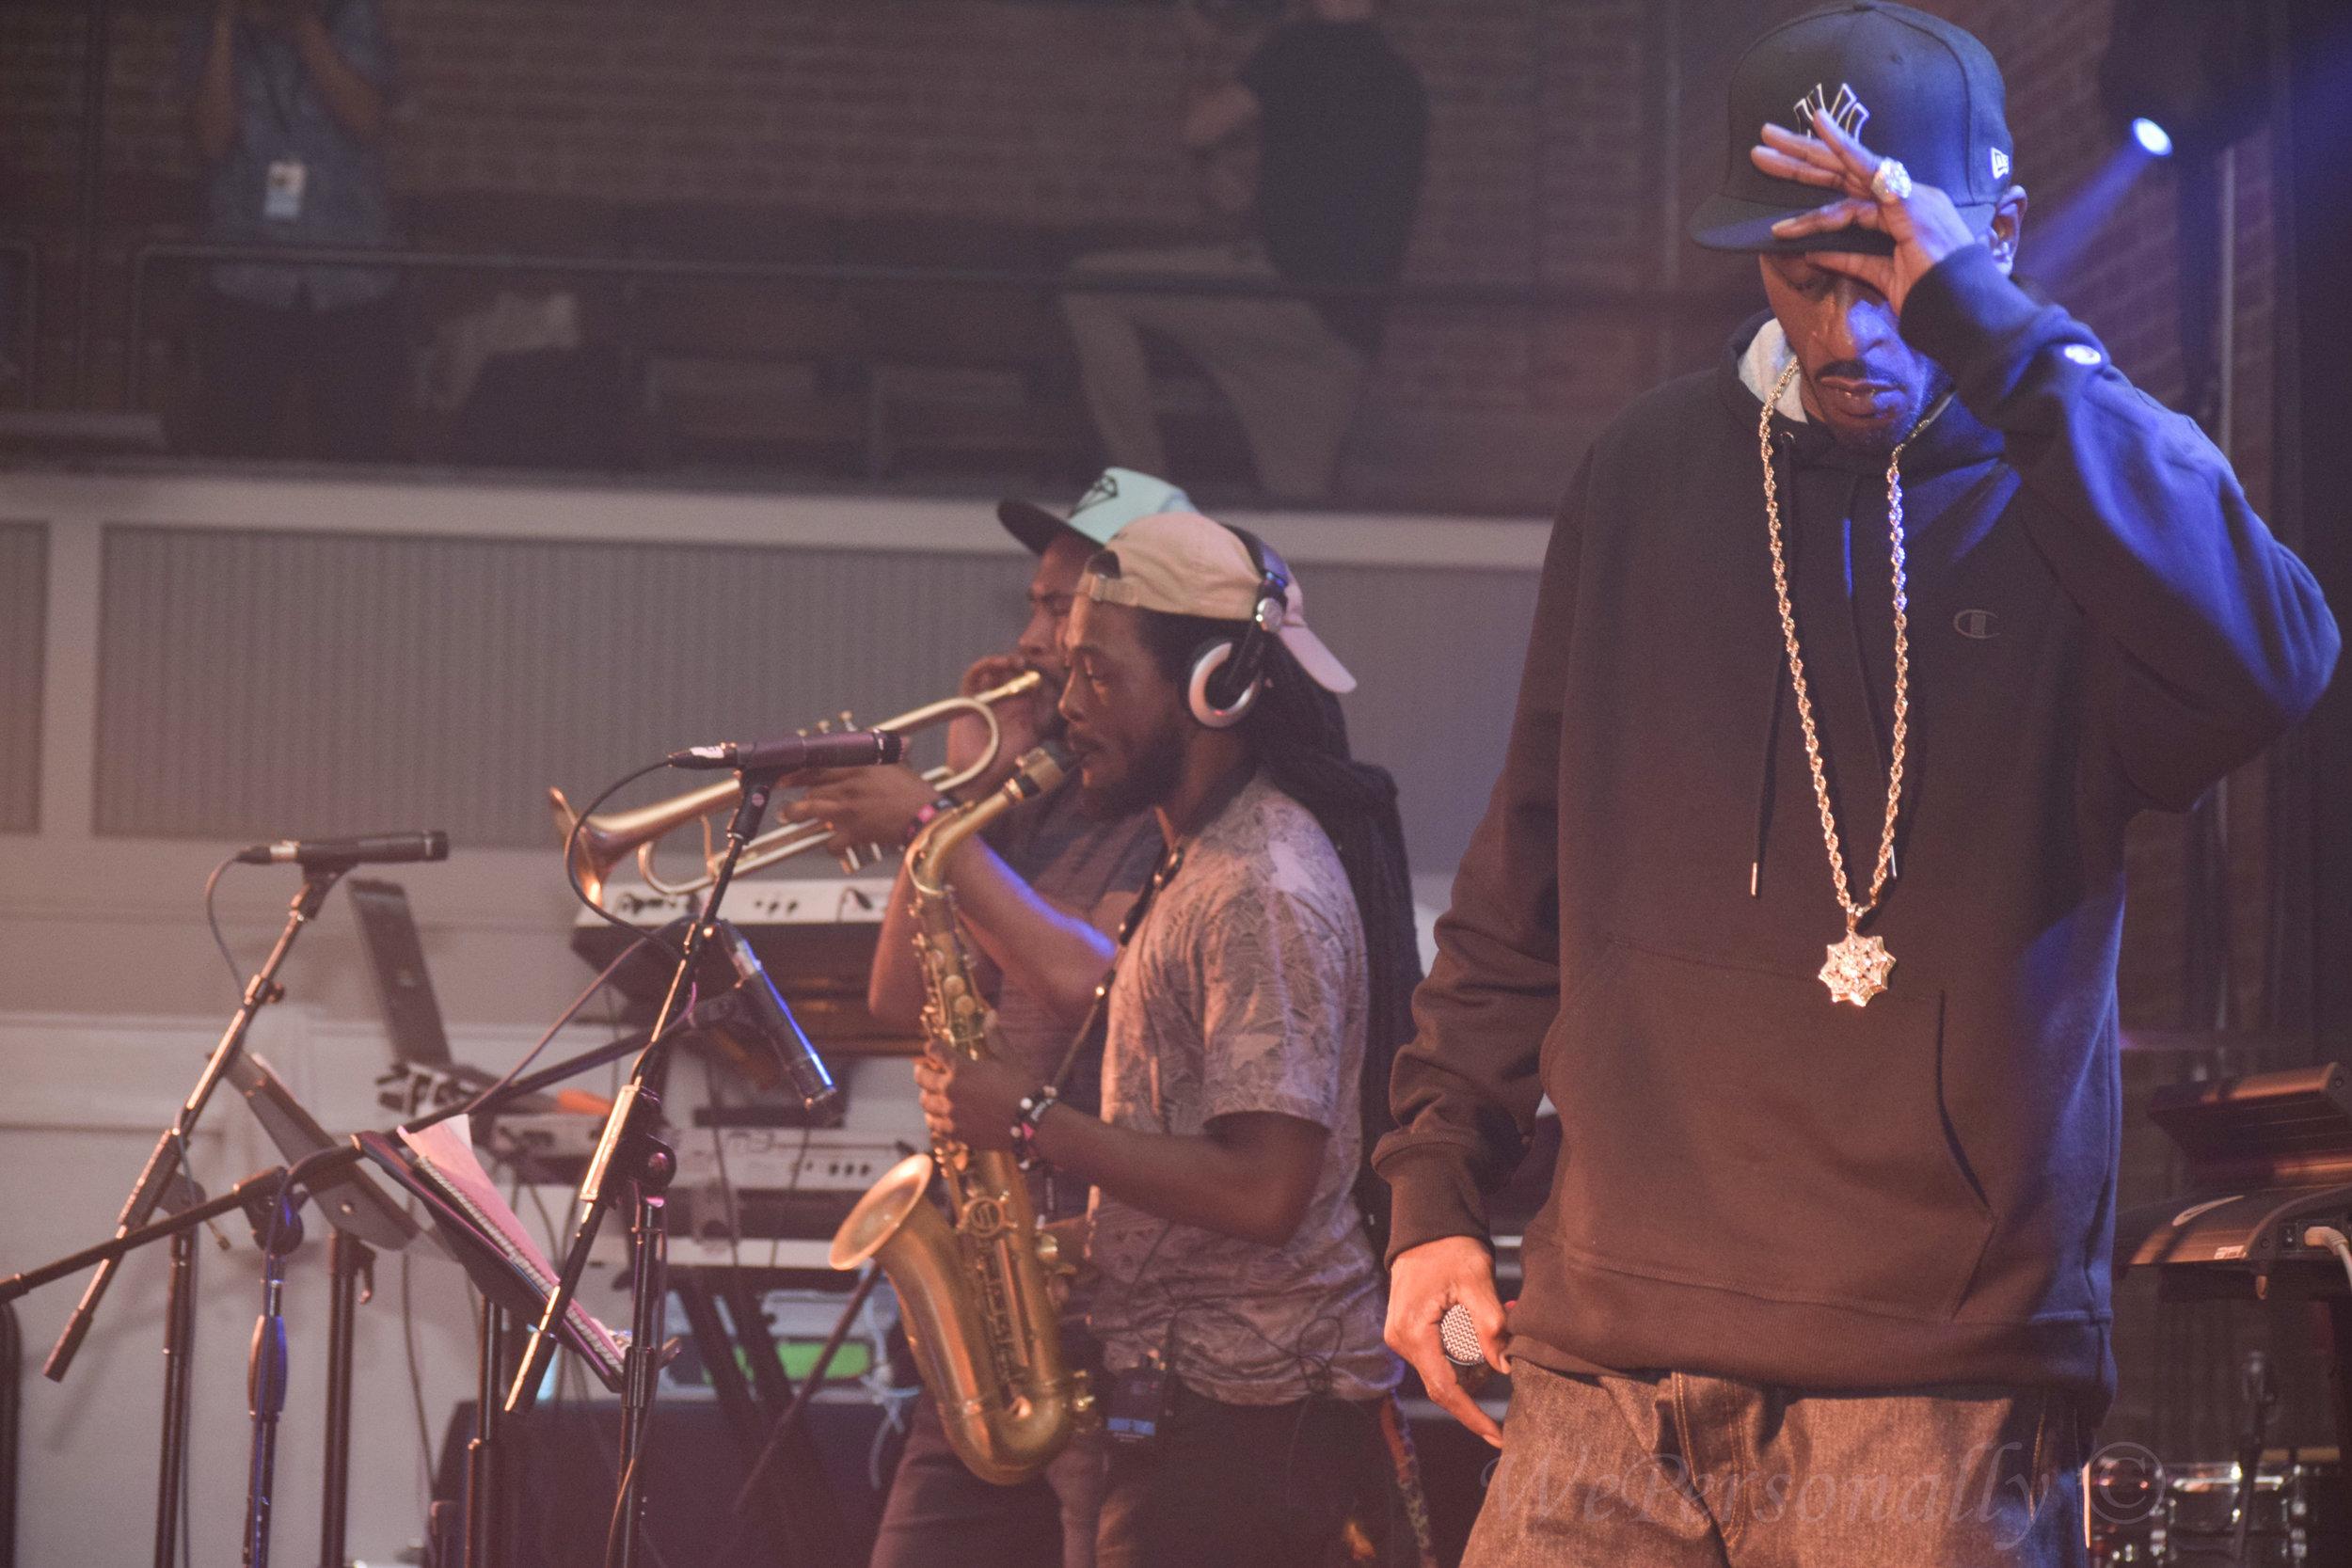 Hip Hop Legend Lyricist Rakim rocks the mic at the Durham Armory!